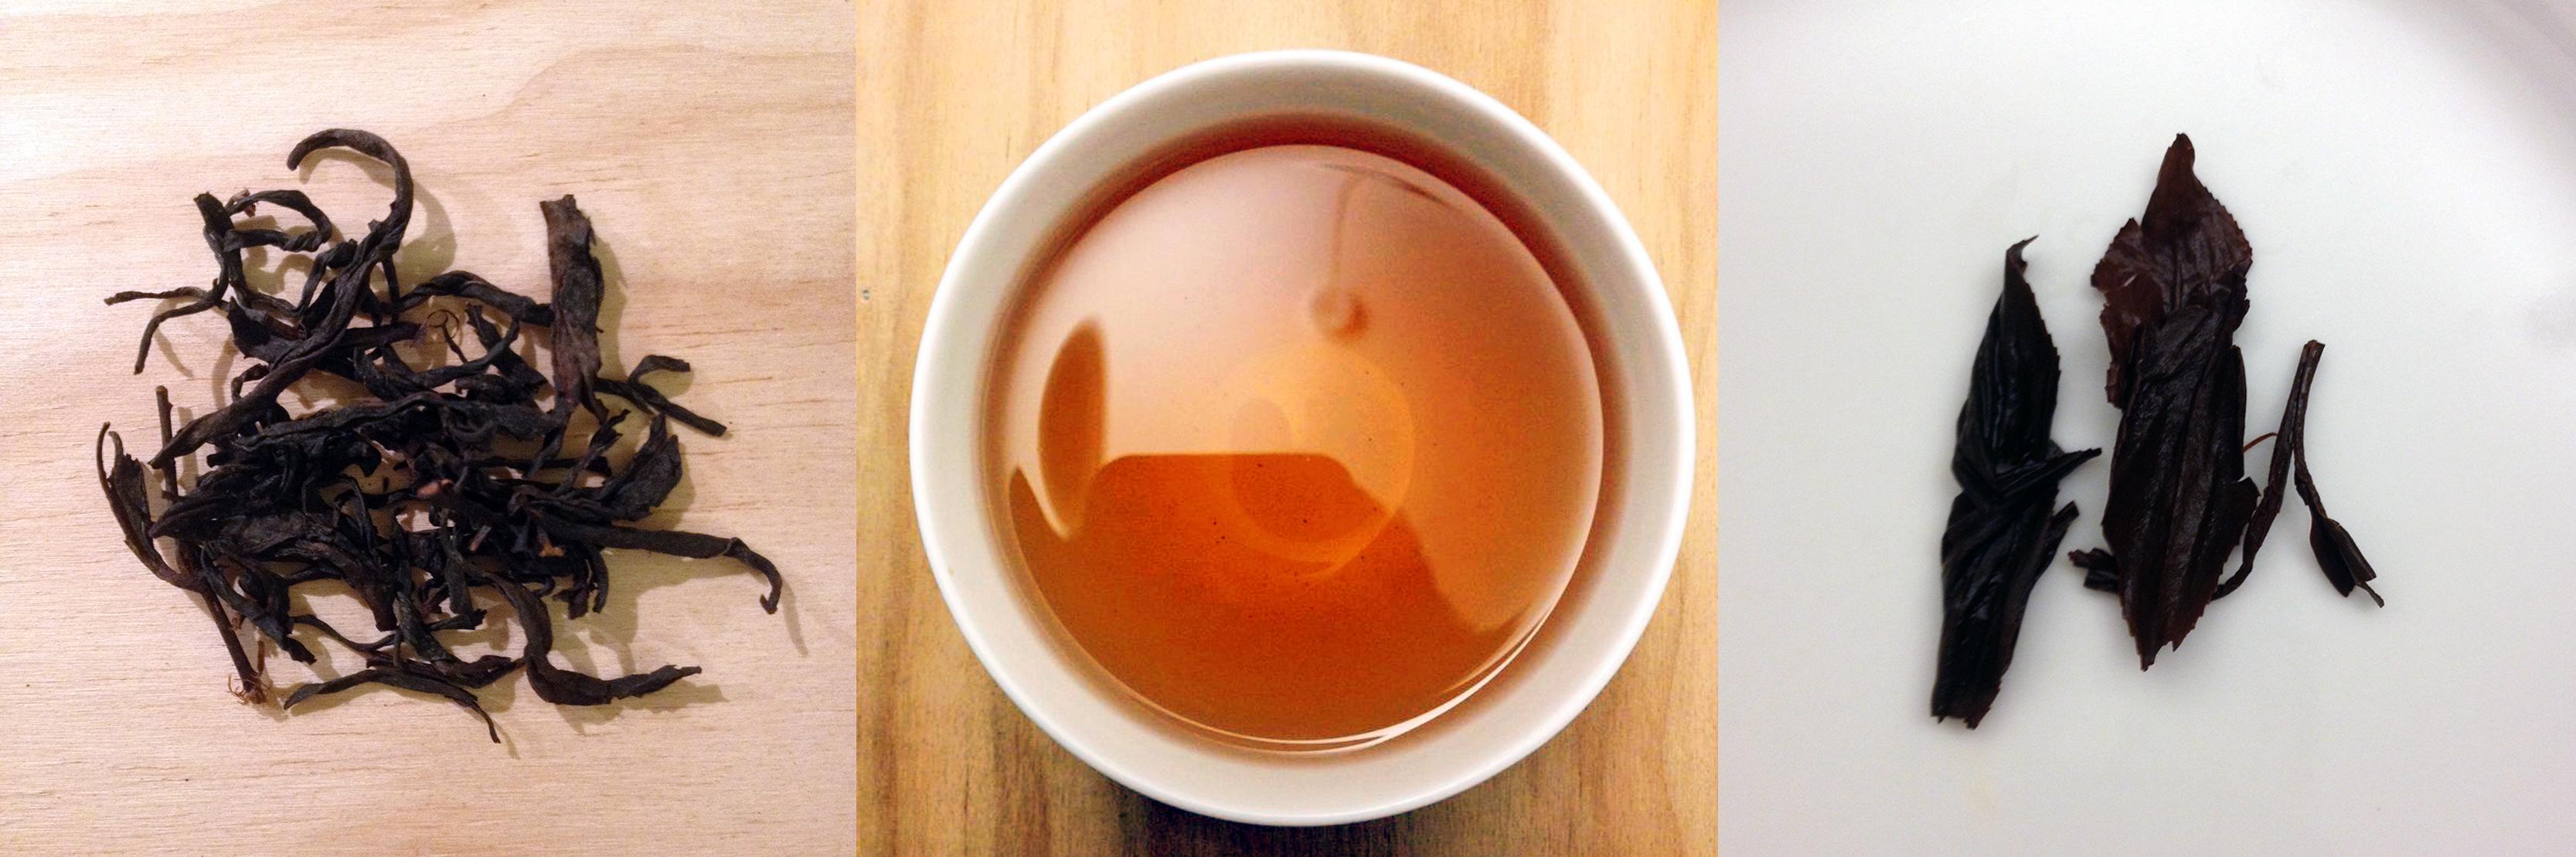 Yuchi wild tea